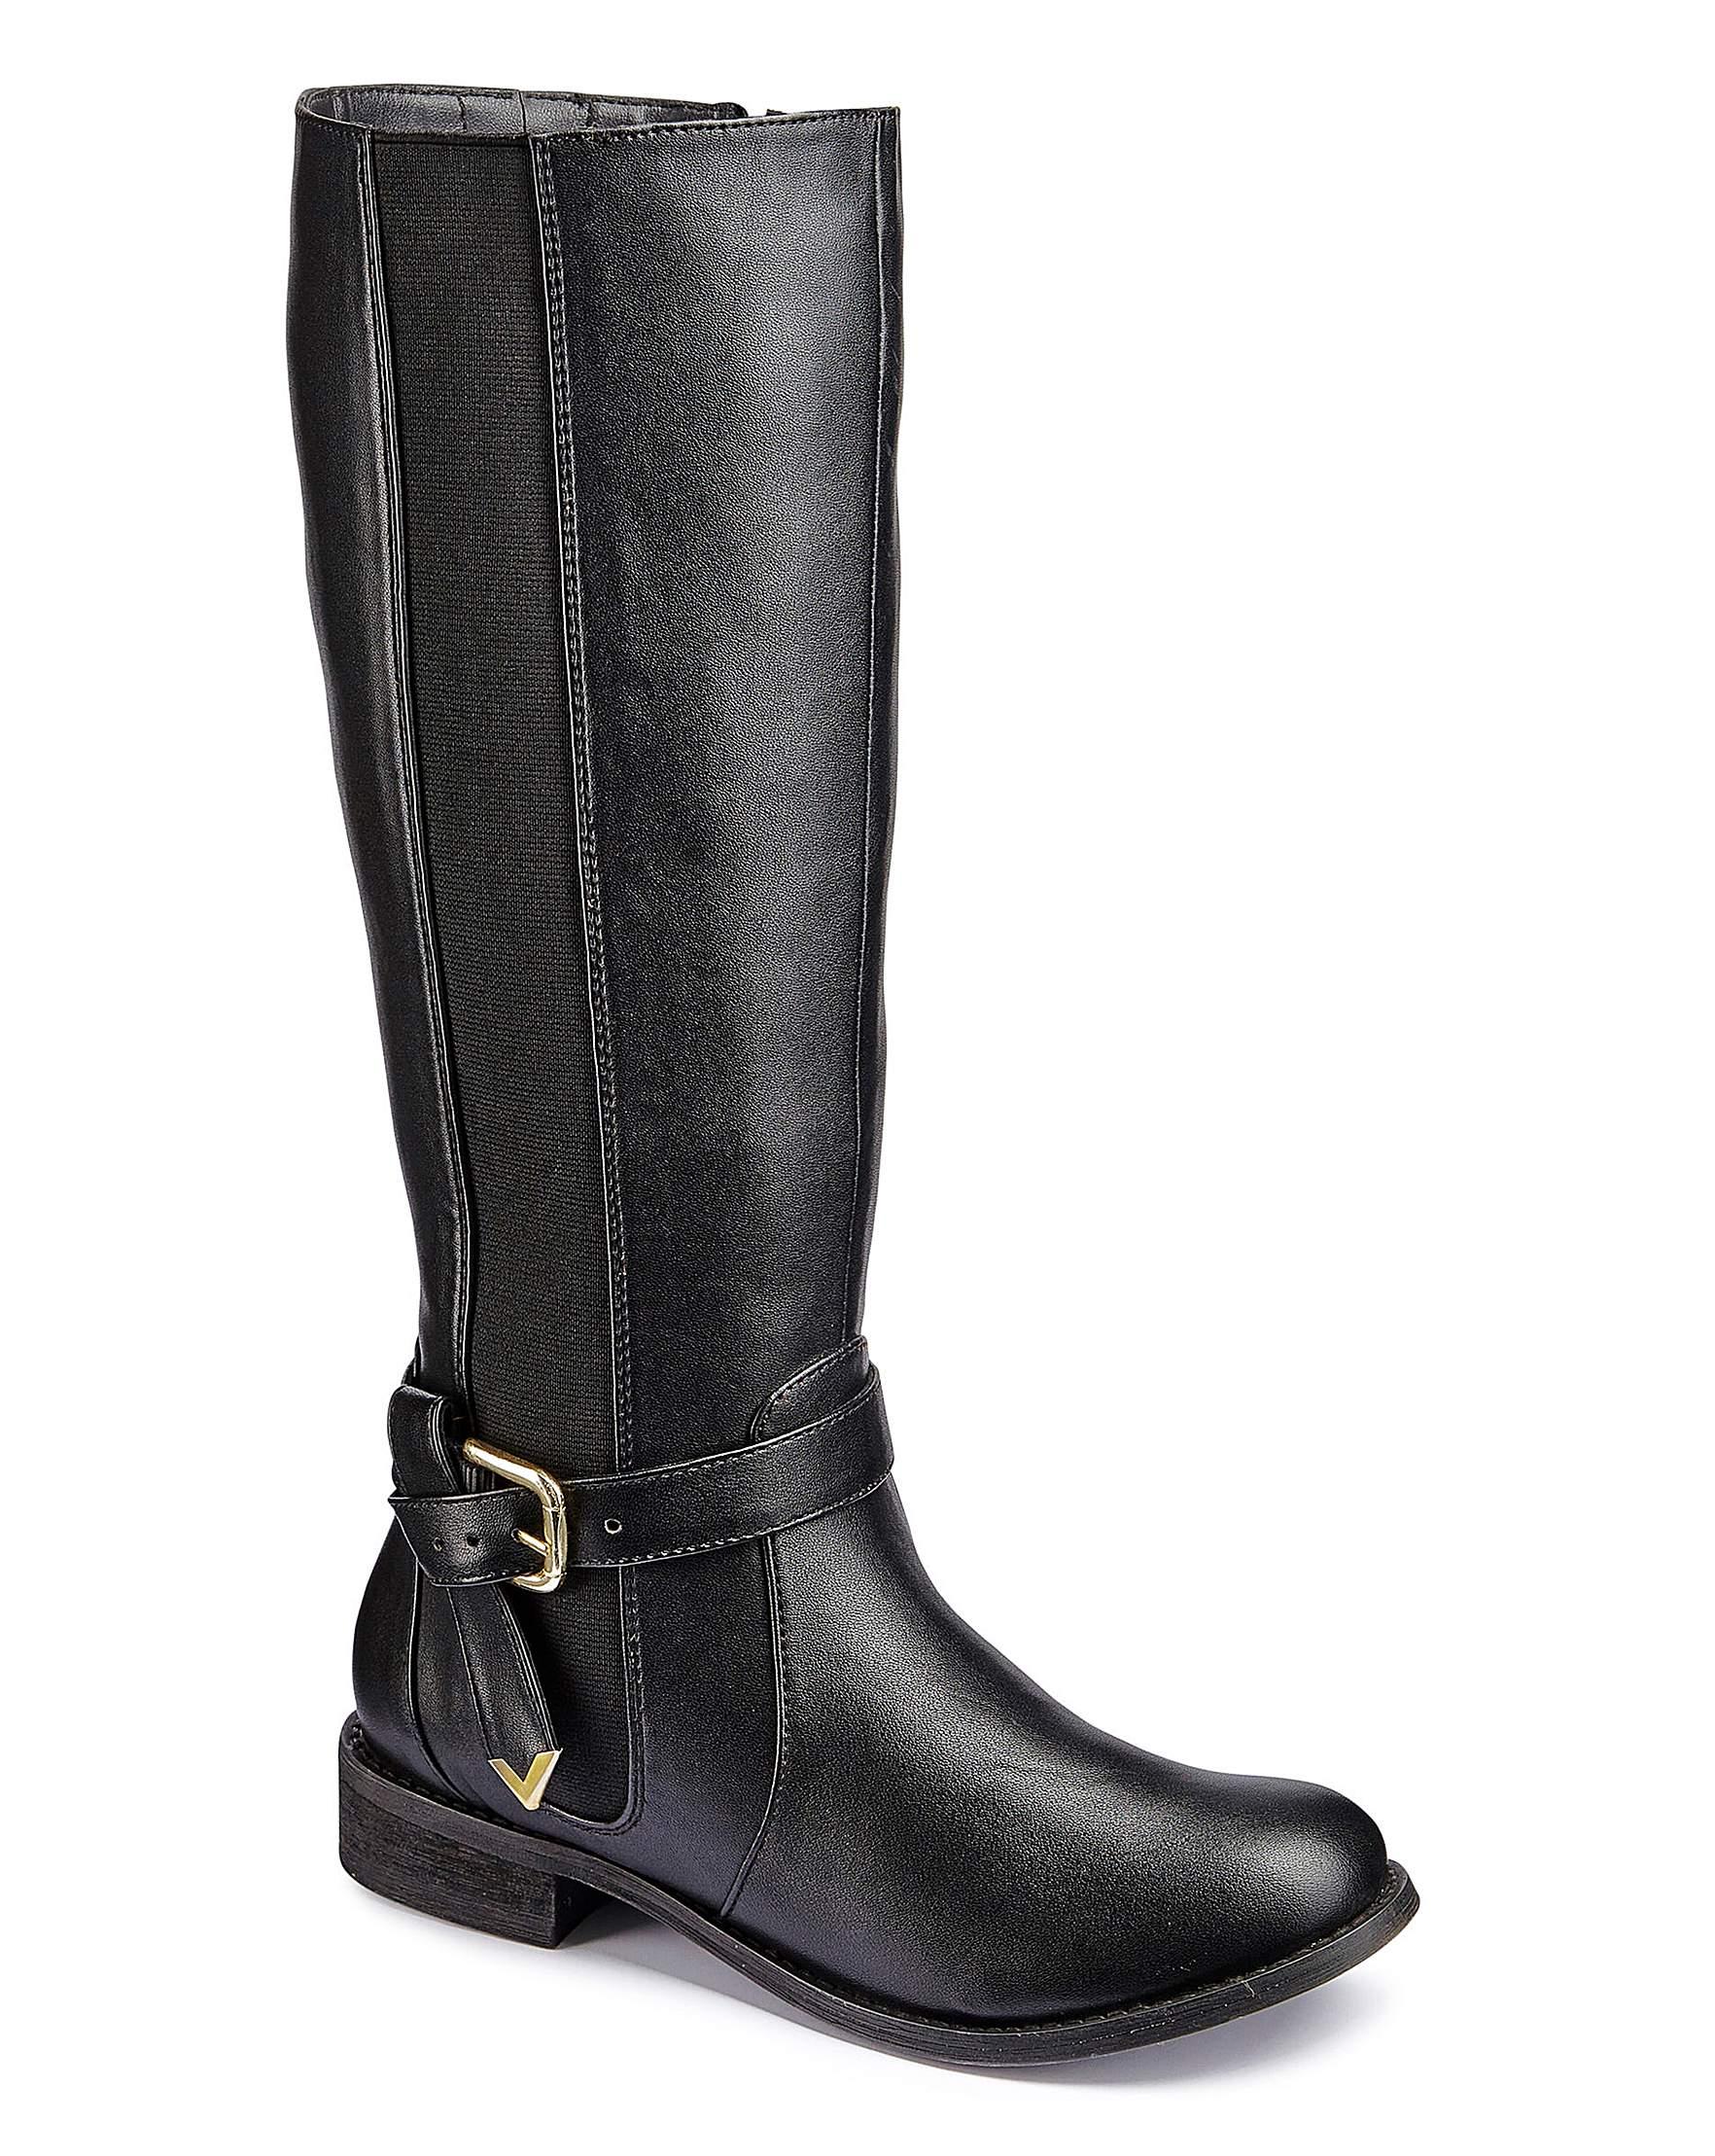 5edce19485b4 Legroom Elastic Detail Biker Style Boots E Fit Extra Curvy Plus Calf Width